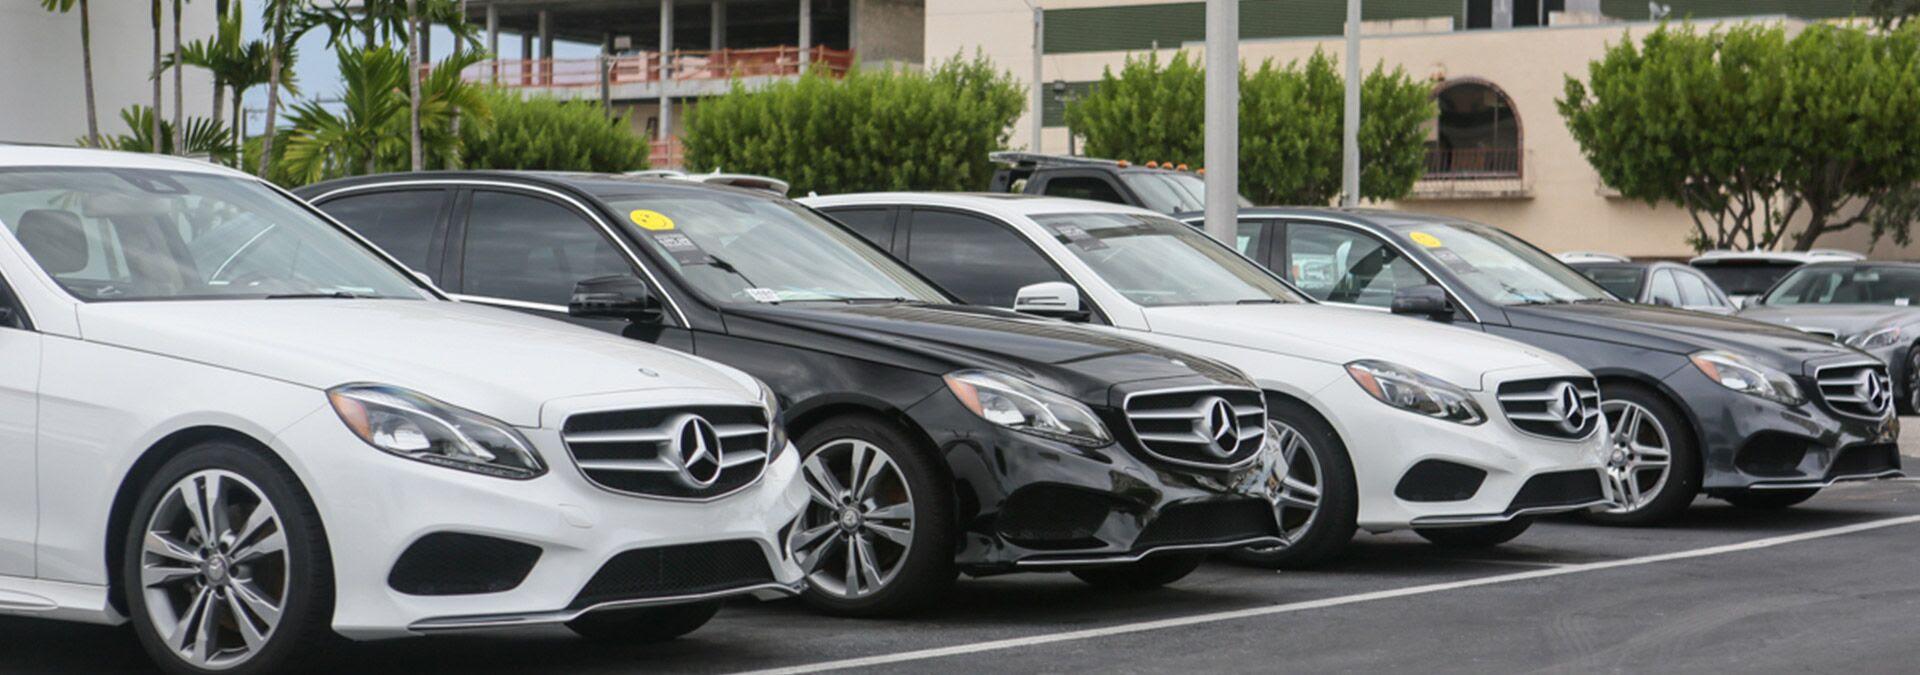 Mercedes-Benz Dealership Miami FL   Used Cars Bill Ussery ...